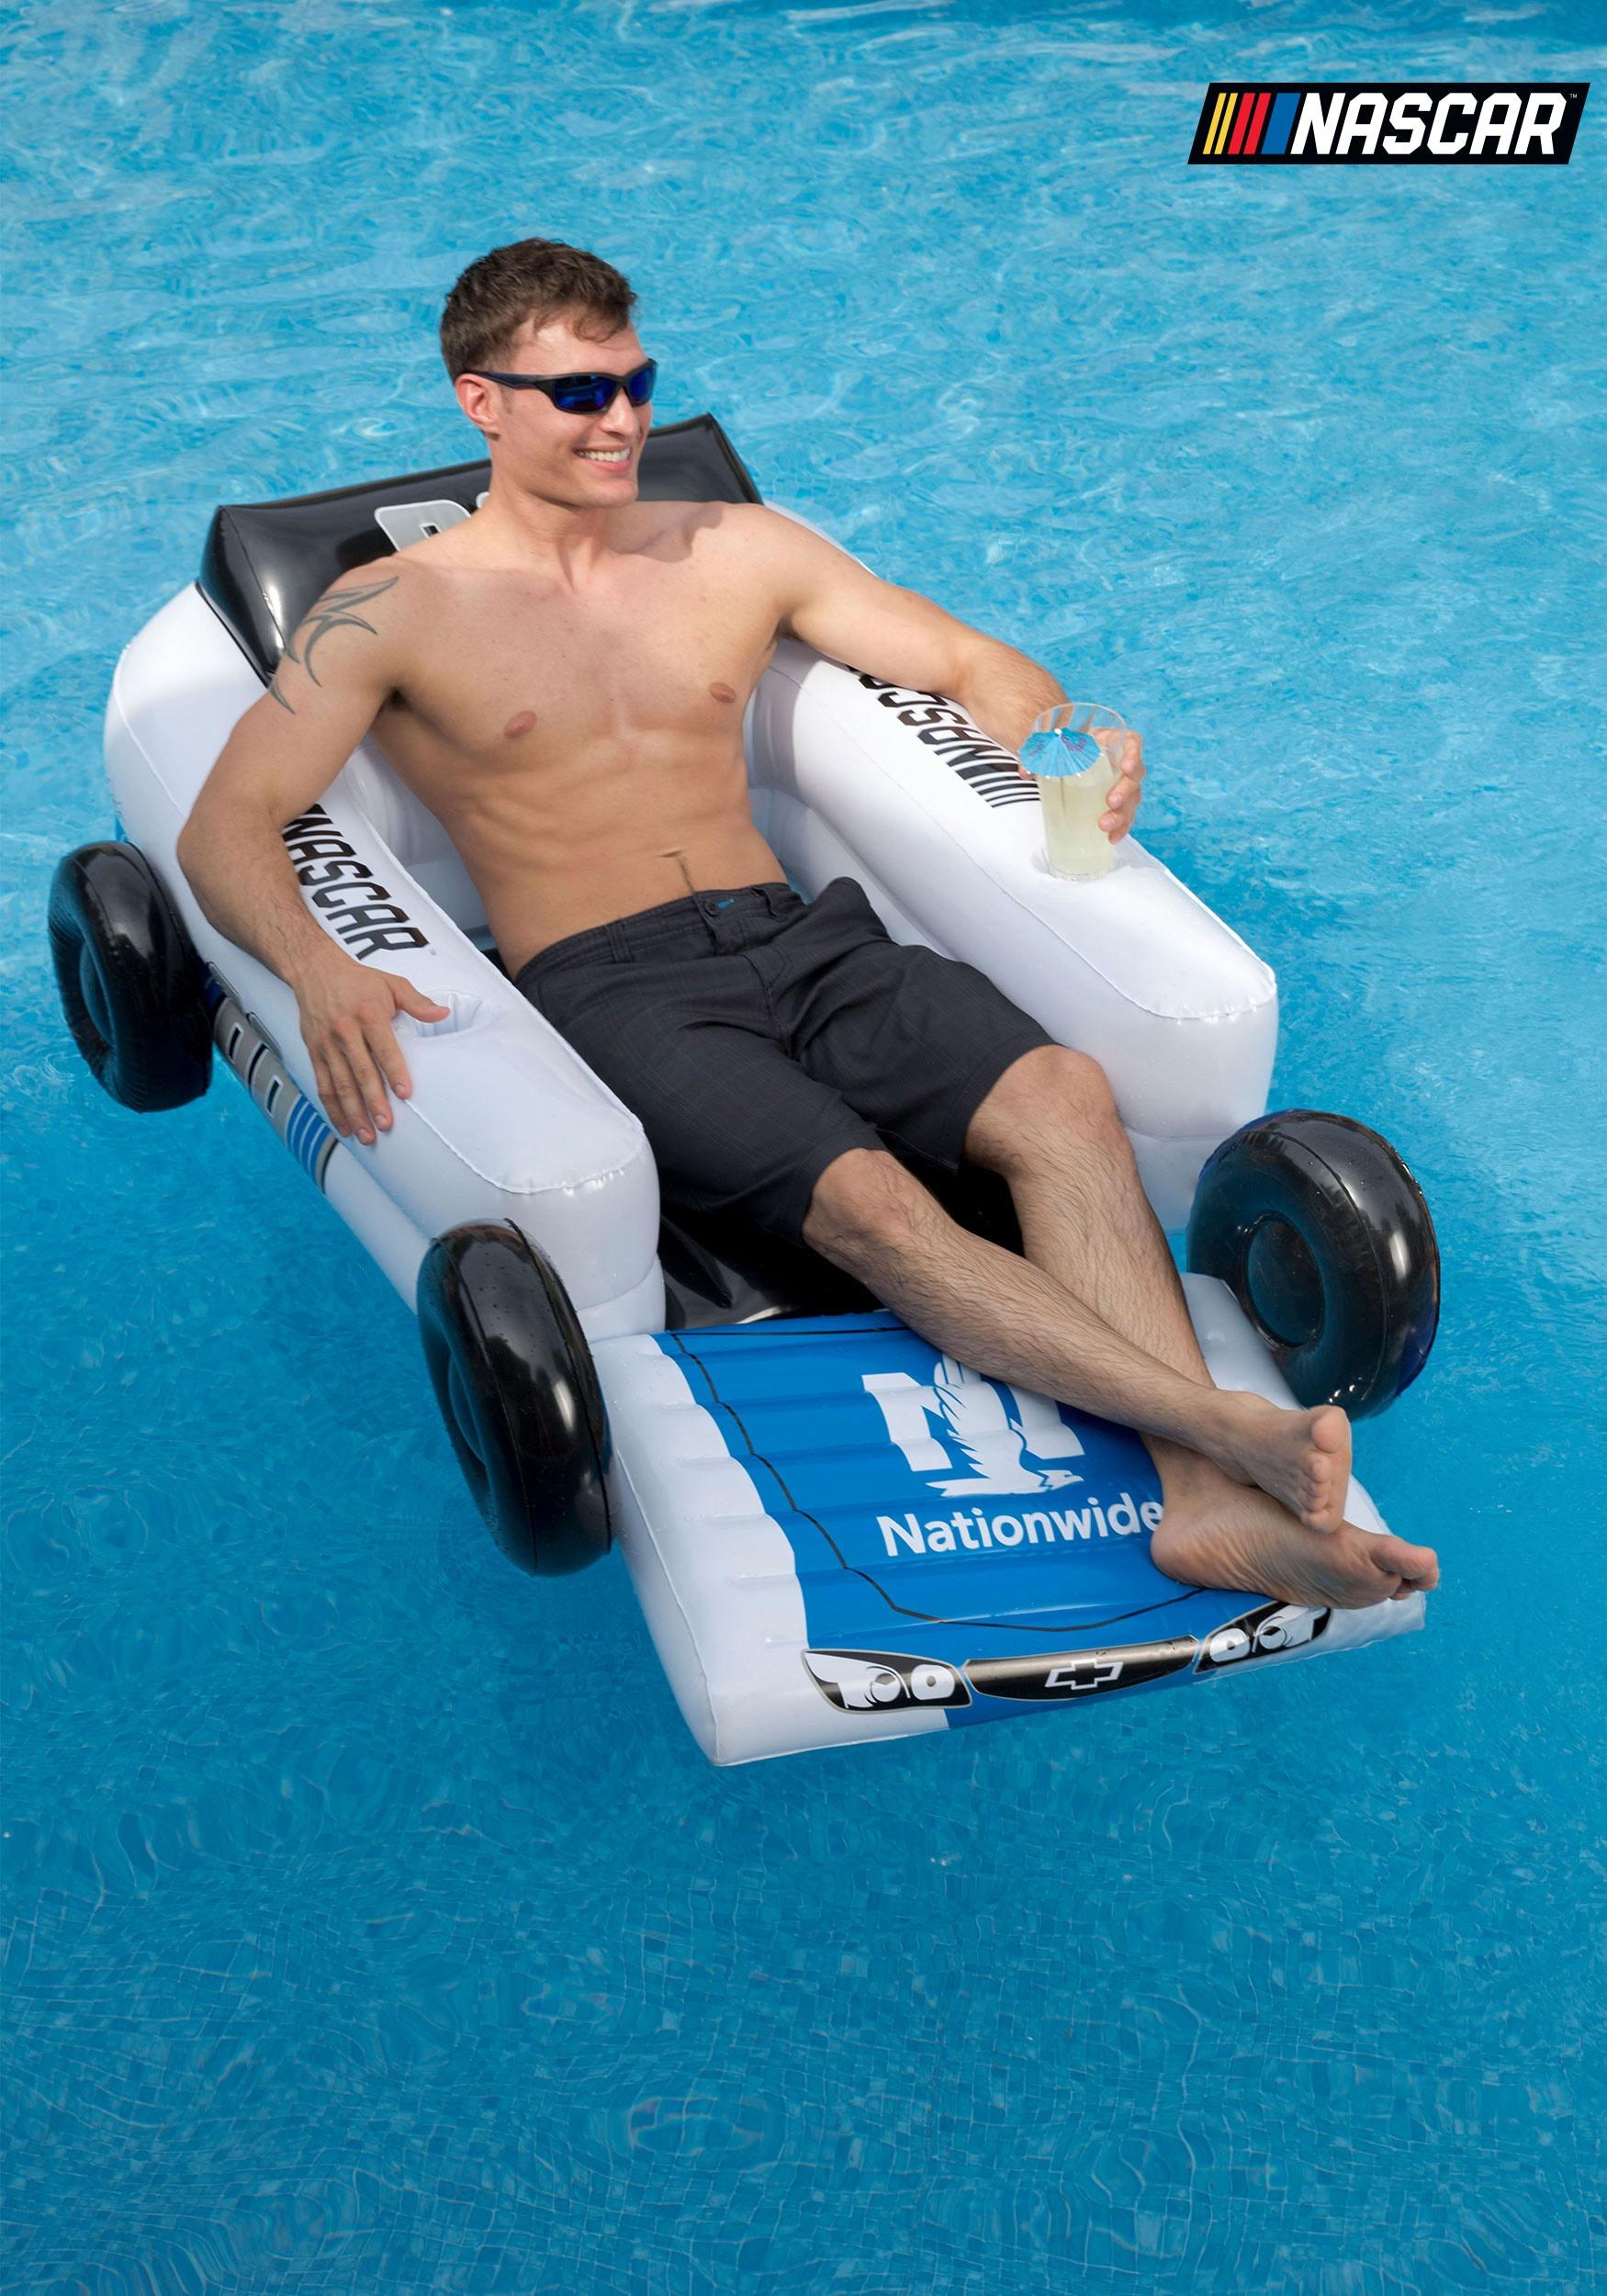 dale earnhardt jr nascar pool lounger chair